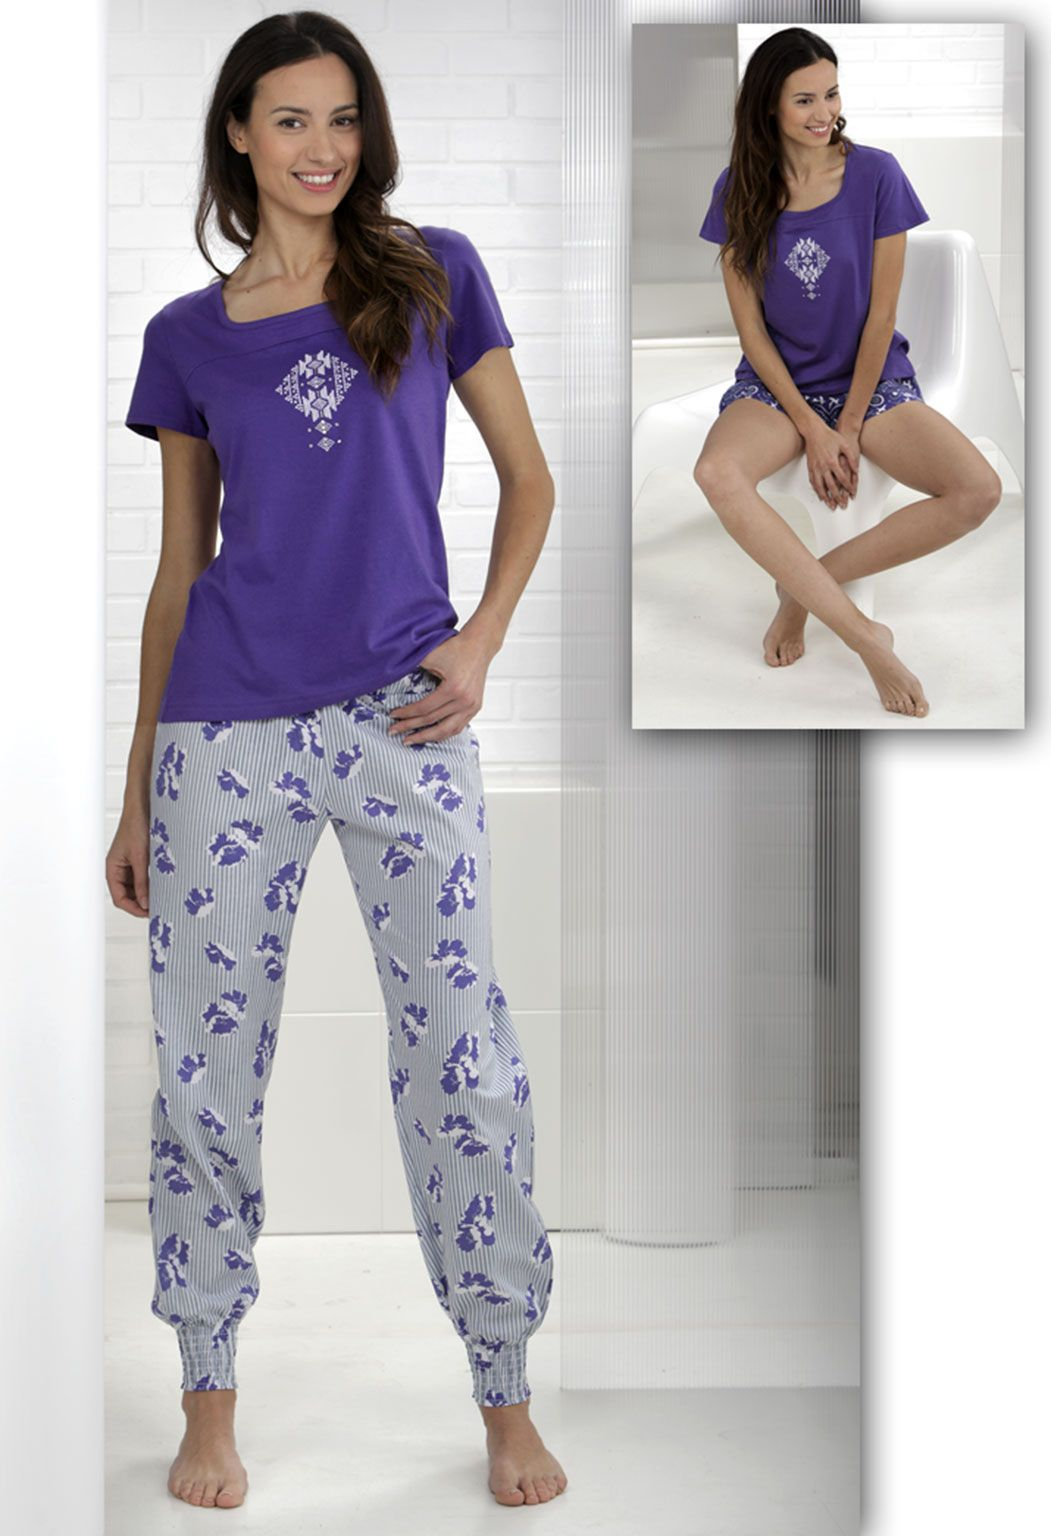 camiseta 3 Massana corta geométrico largo Massanahomewear estampado floral Pyjama pijama y piezas Pantalón Shorts Women Conjunto UZvxRv